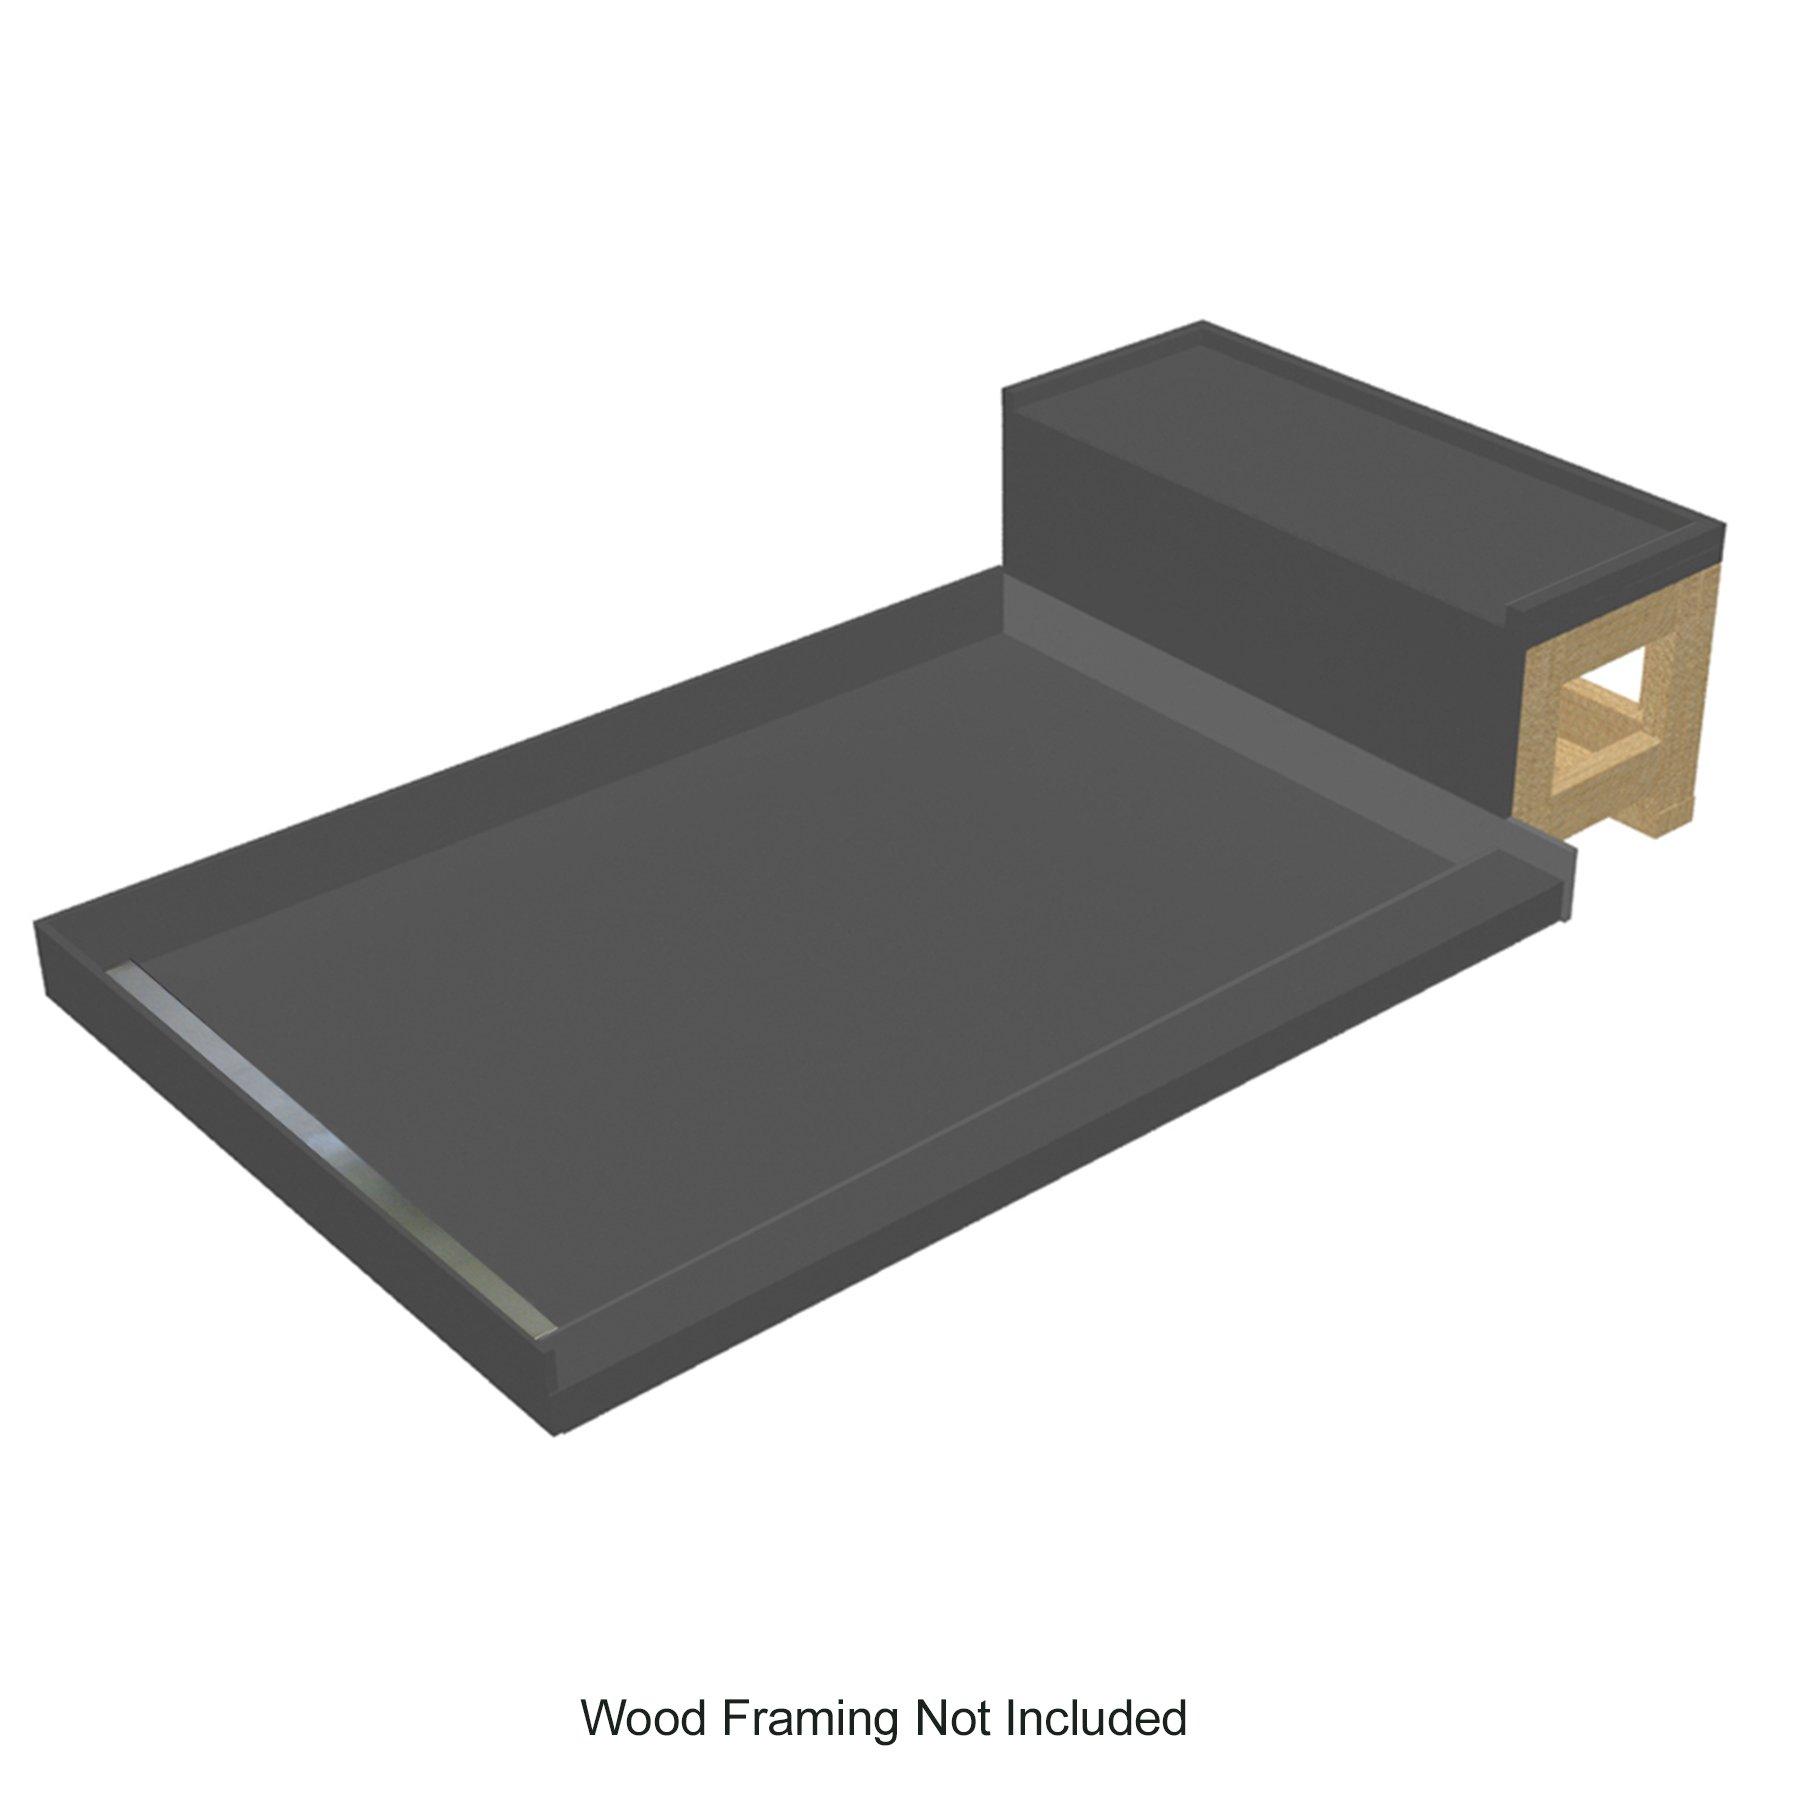 Tile Redi USA WF4848L-RB48-KIT Base'N Bench WonderFall Trench Left Drain Base with Seat, 48'' D x 60'' W